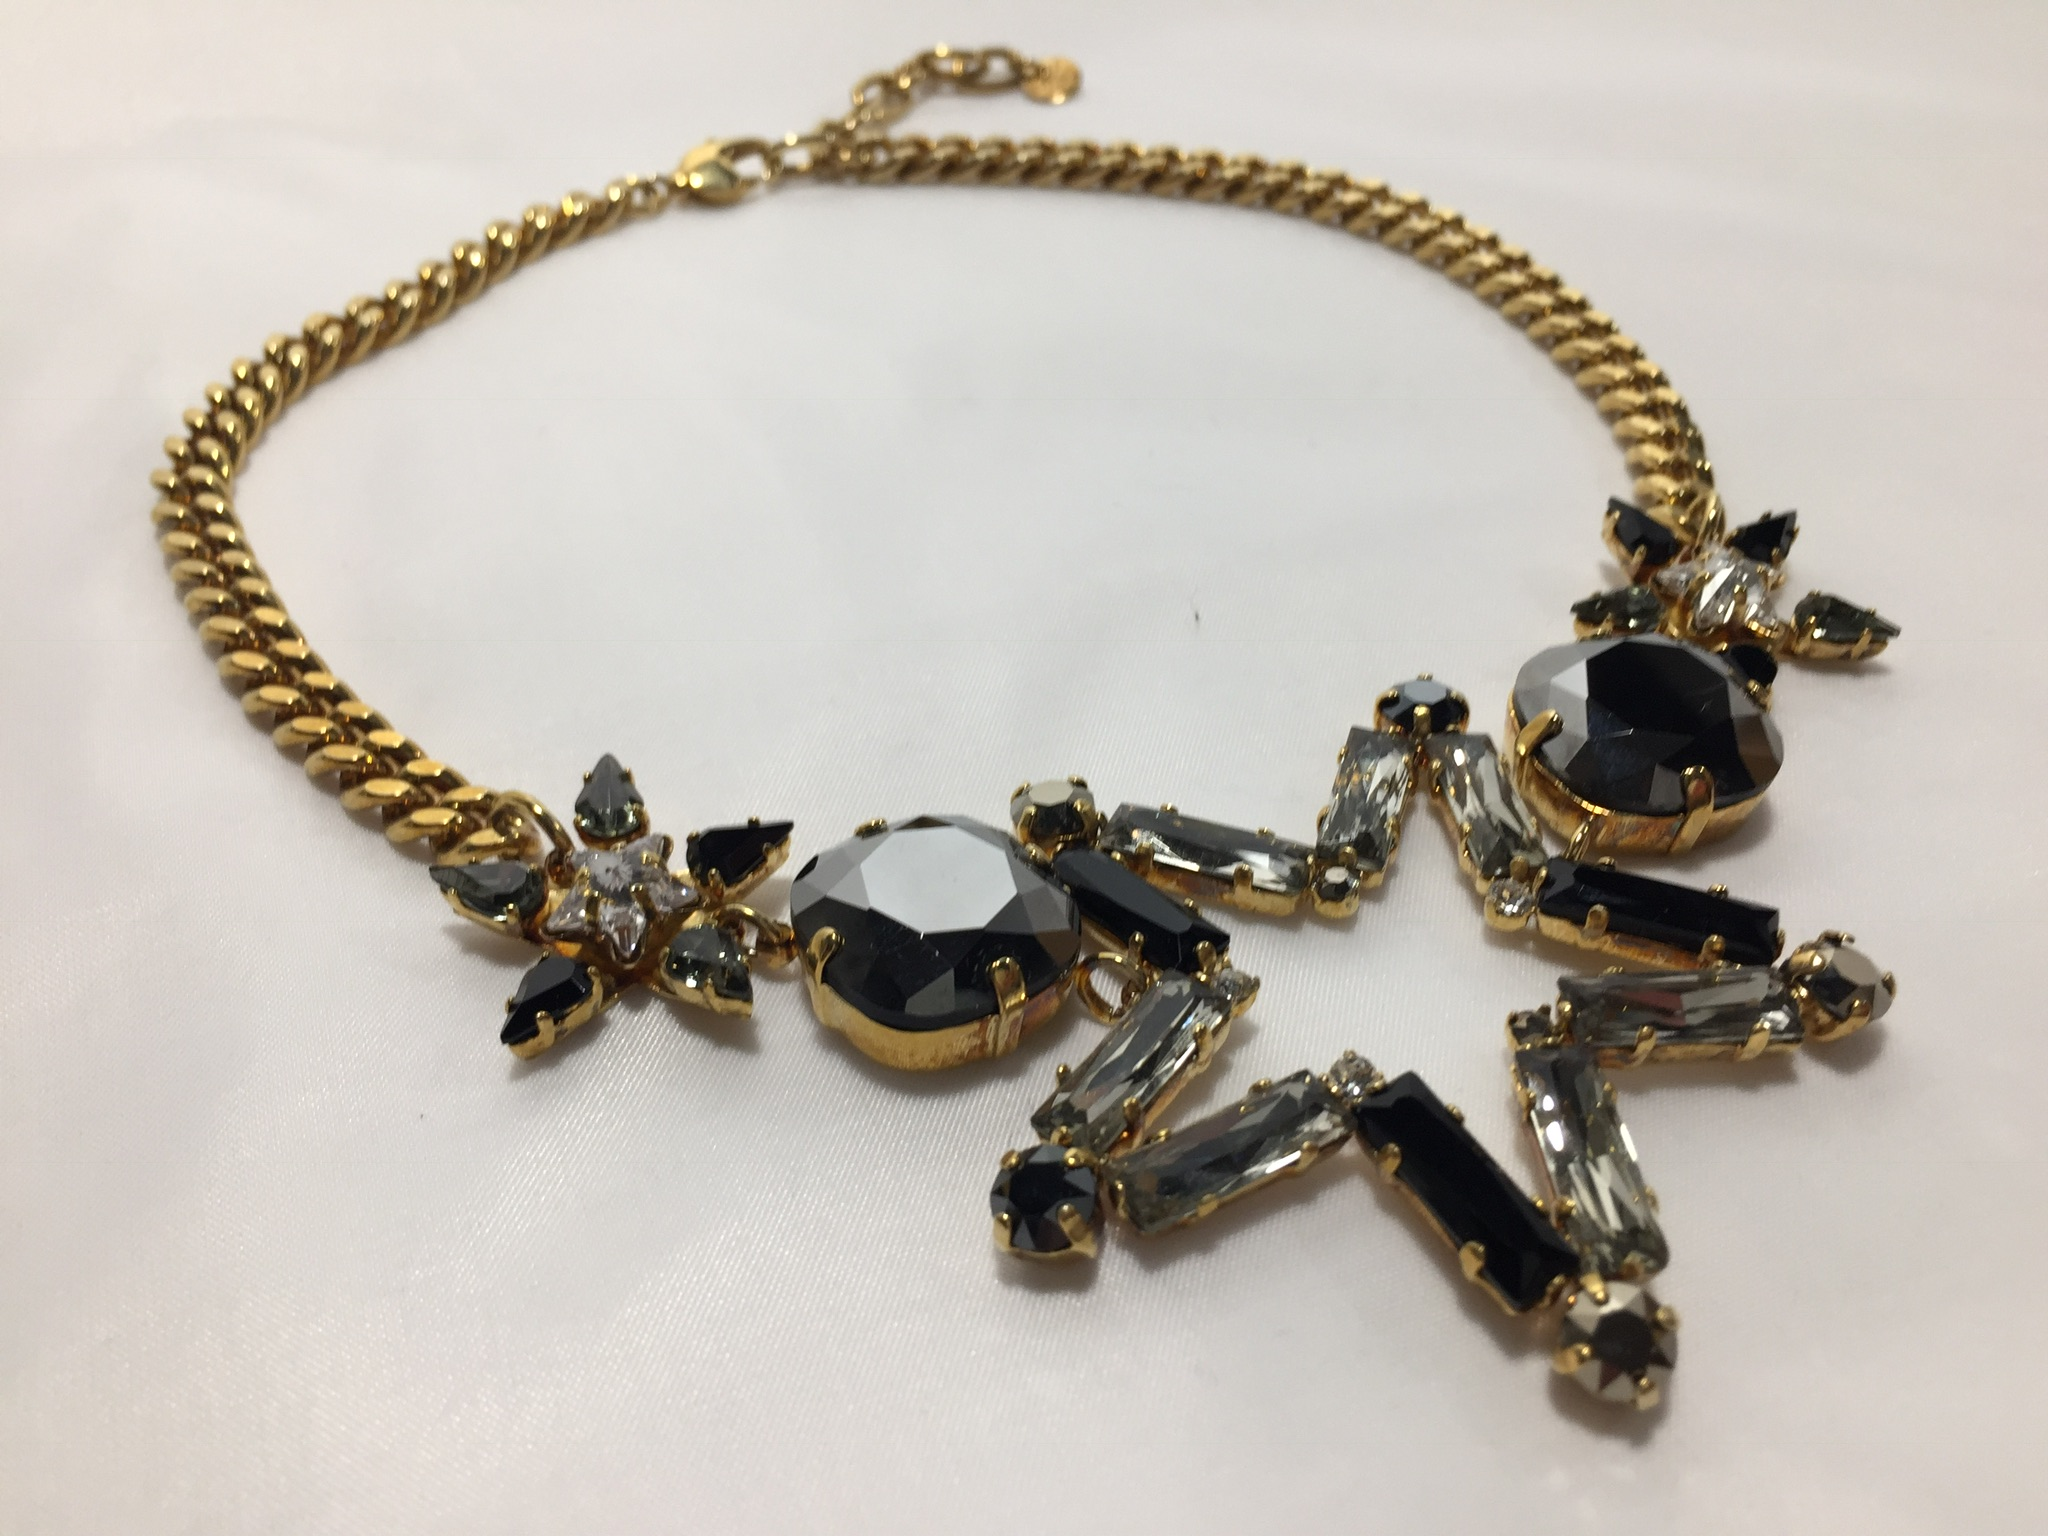 Bijoux fantaisies reminiscence collier astre